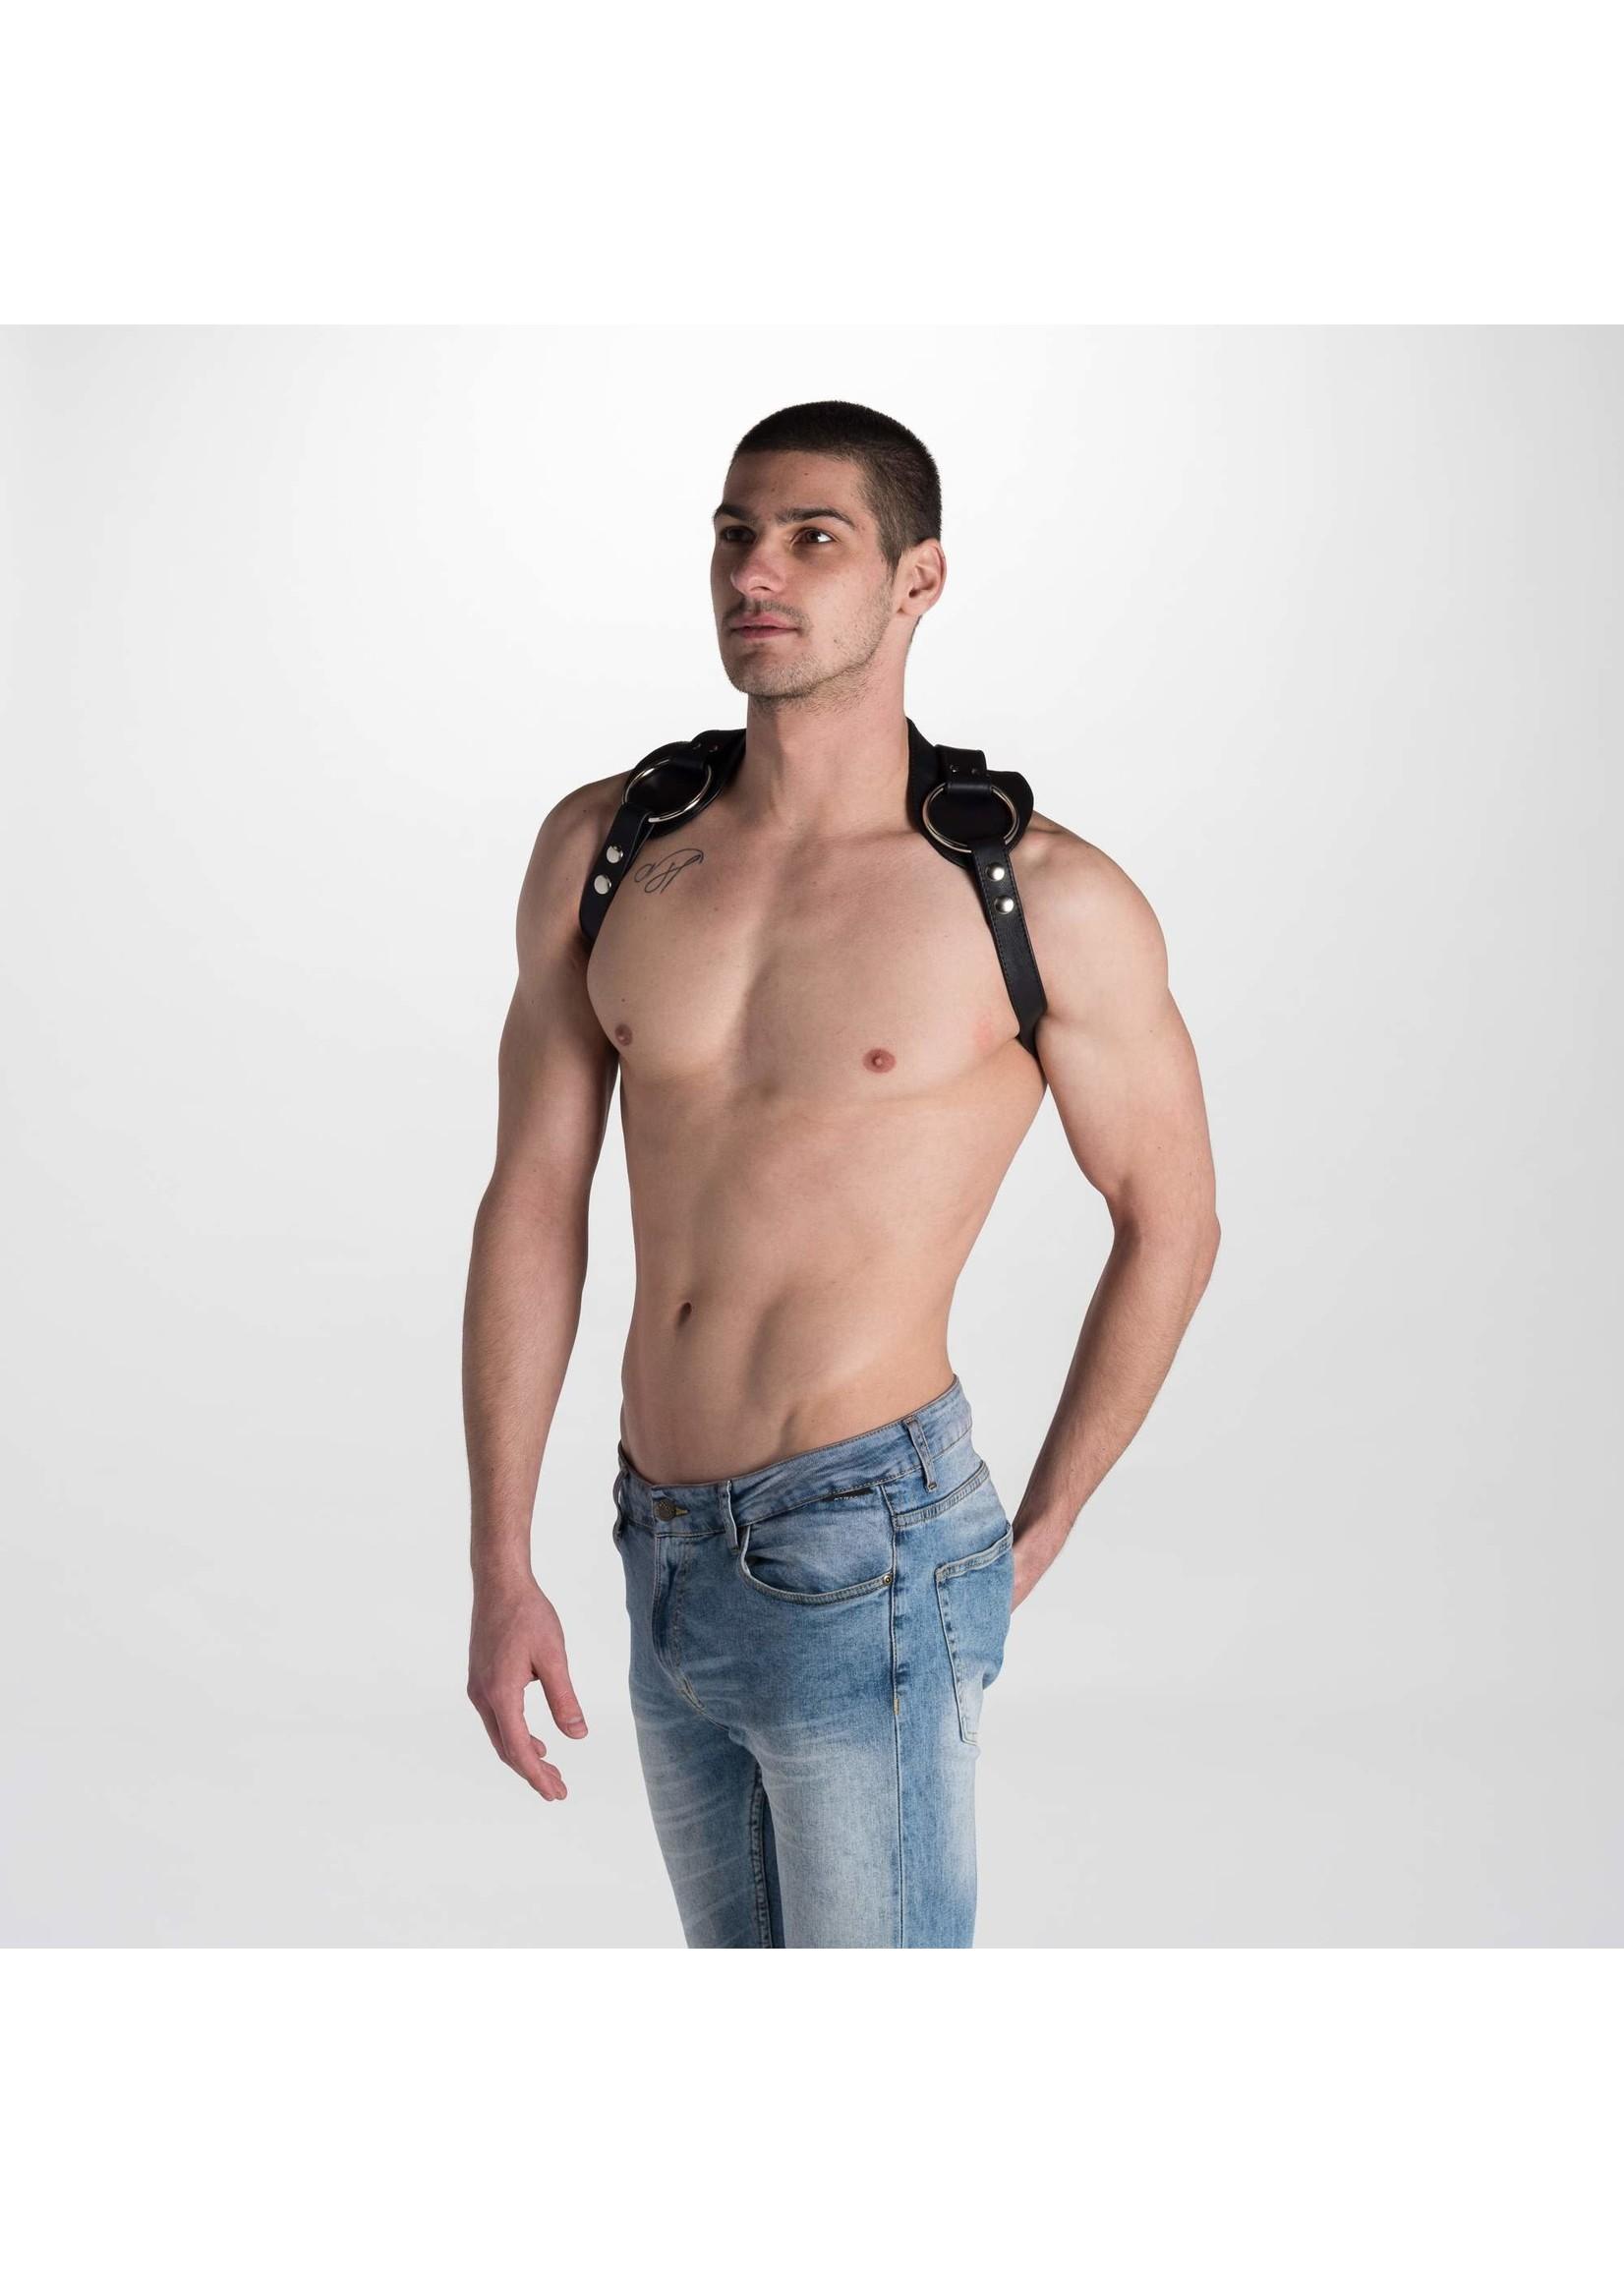 665 Leather 665 Titan Leather Harness